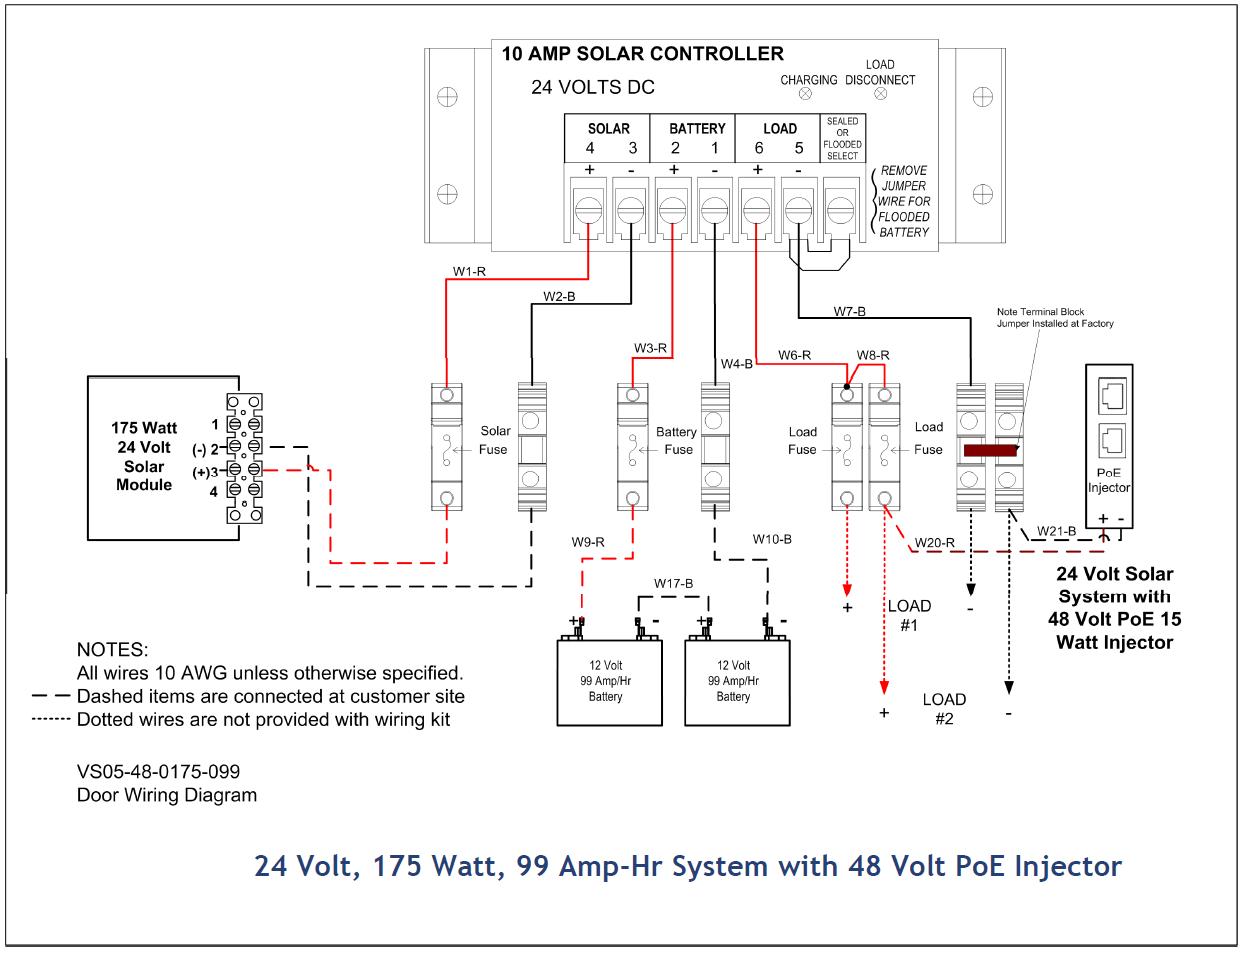 Dk 4168 24 Volt Solar Panel Wiring Diagram View Diagram Wiring Diagram 24 Volt Wiring Diagram